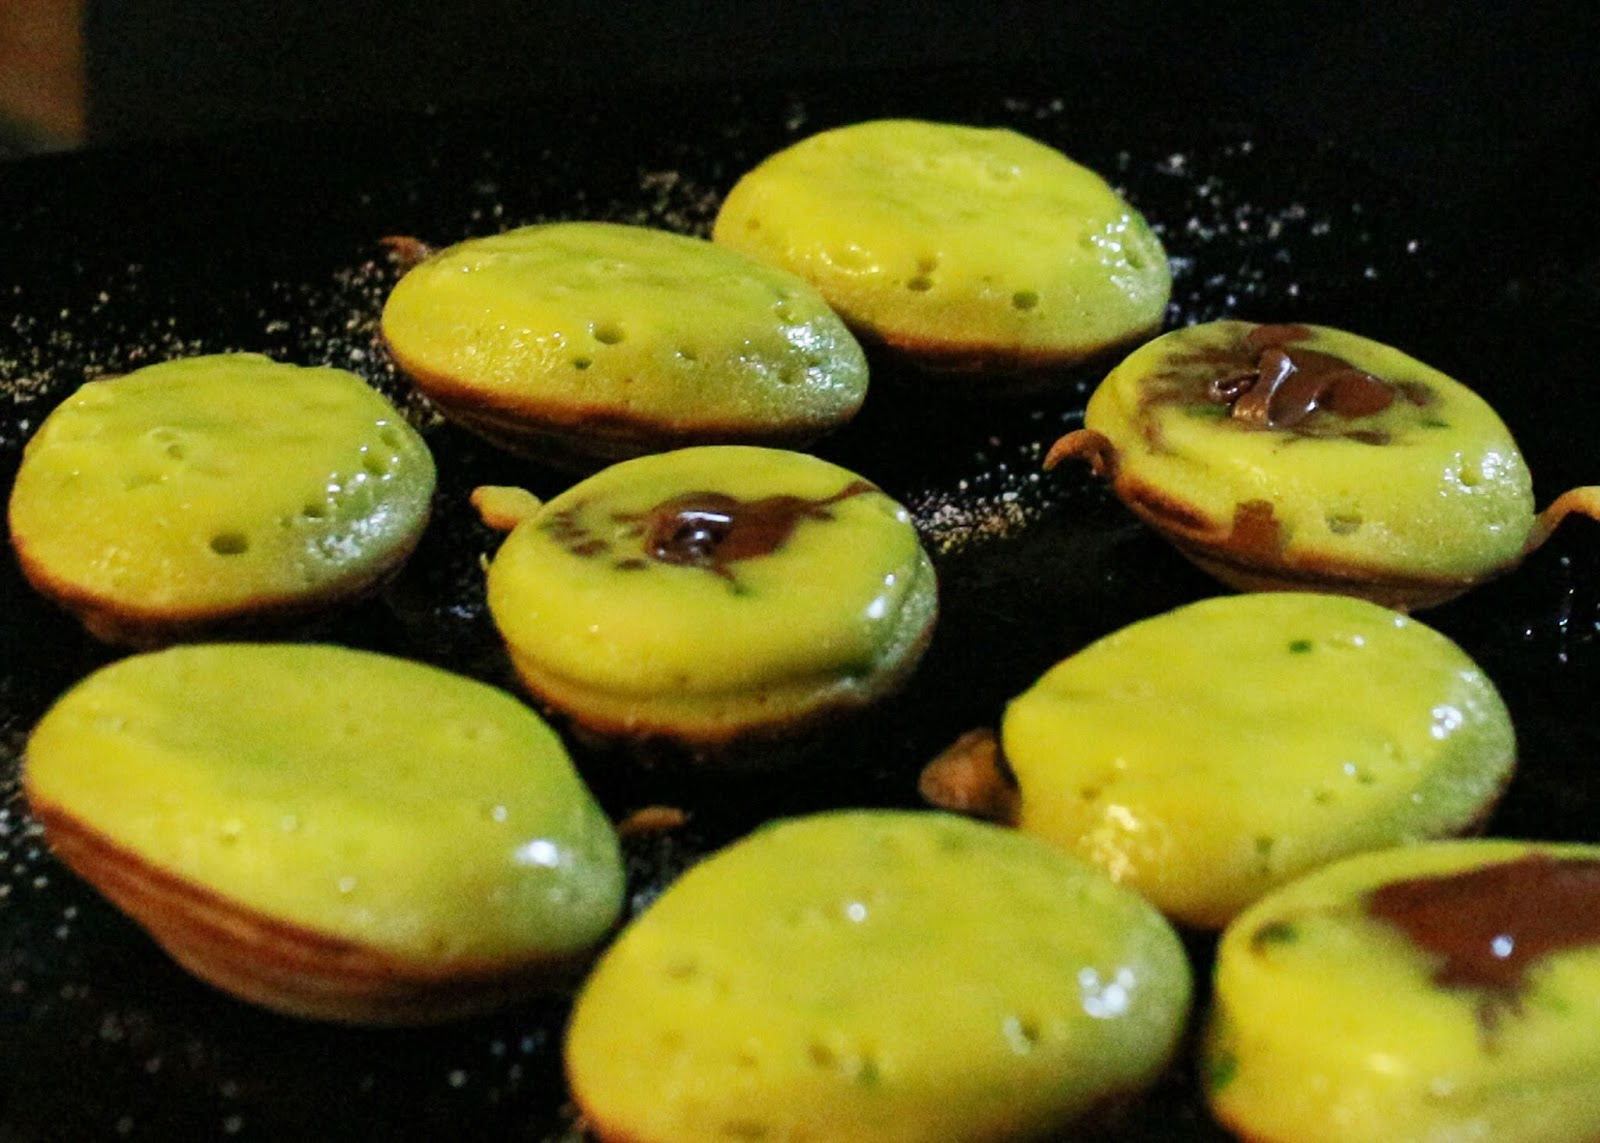 Resep Makanan Ringan Untuk Dijual yang Mudah dan Sederhana